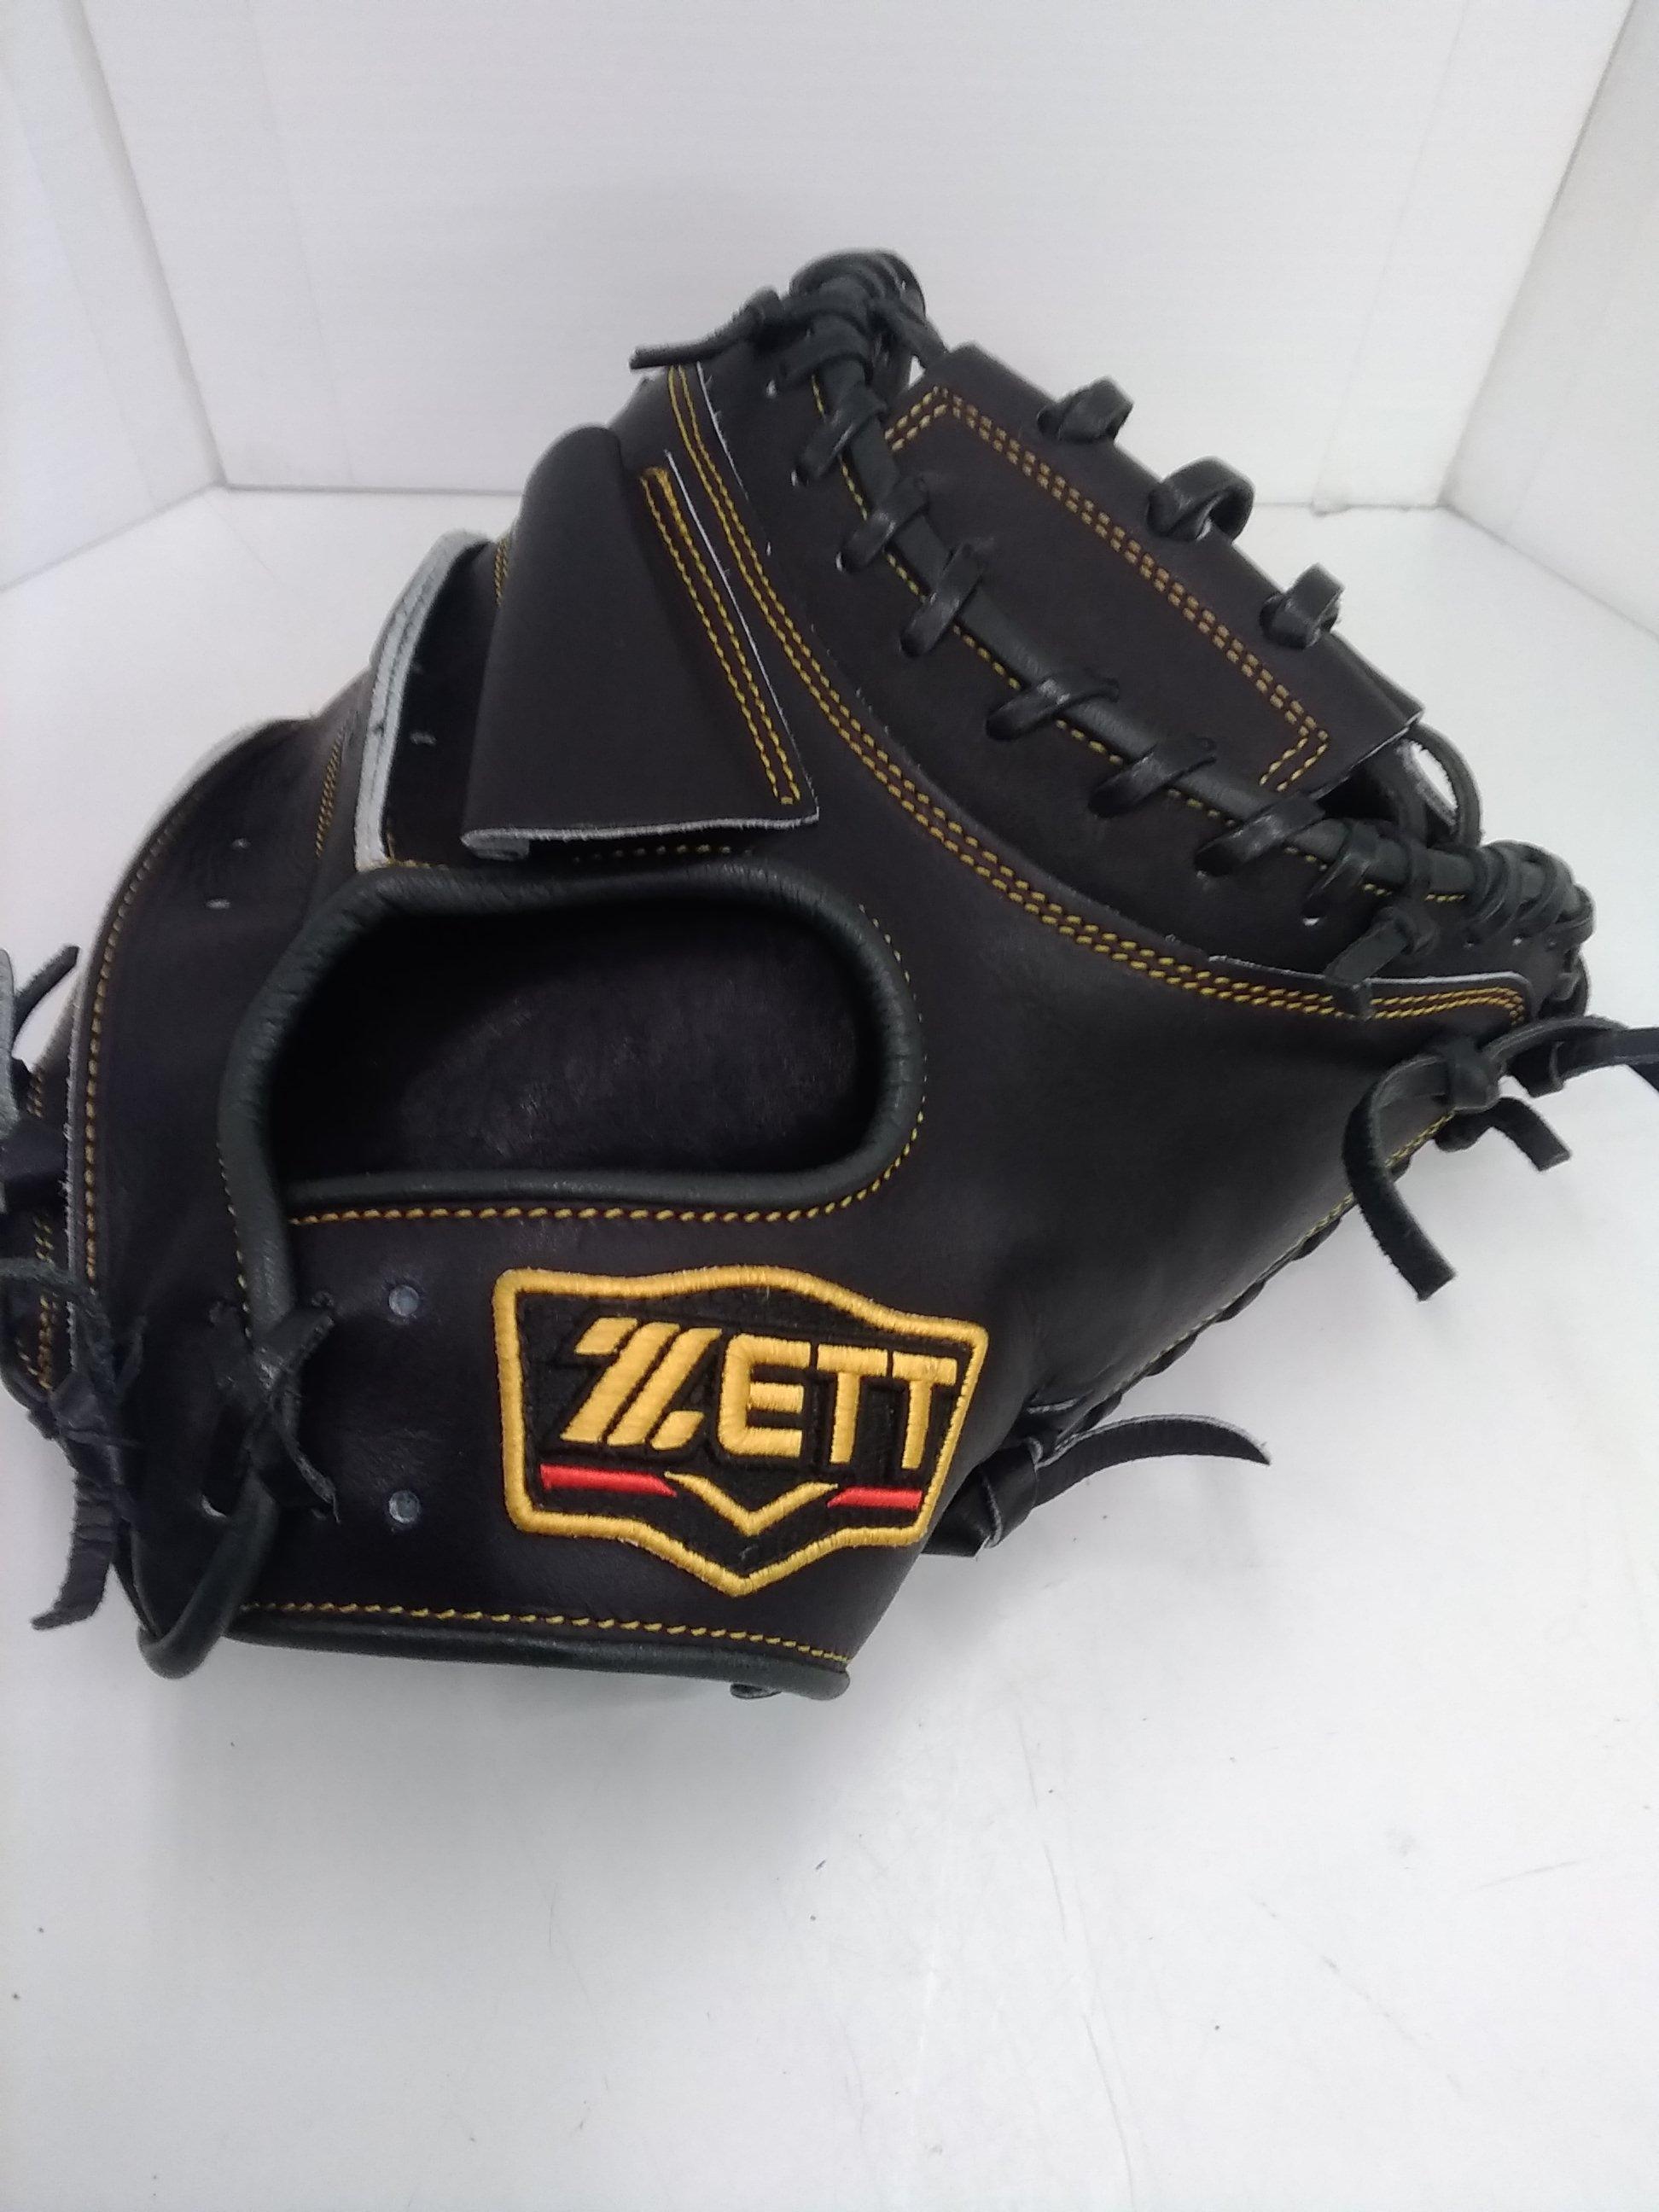 ZETT 硬式捕手モデル|ZETT